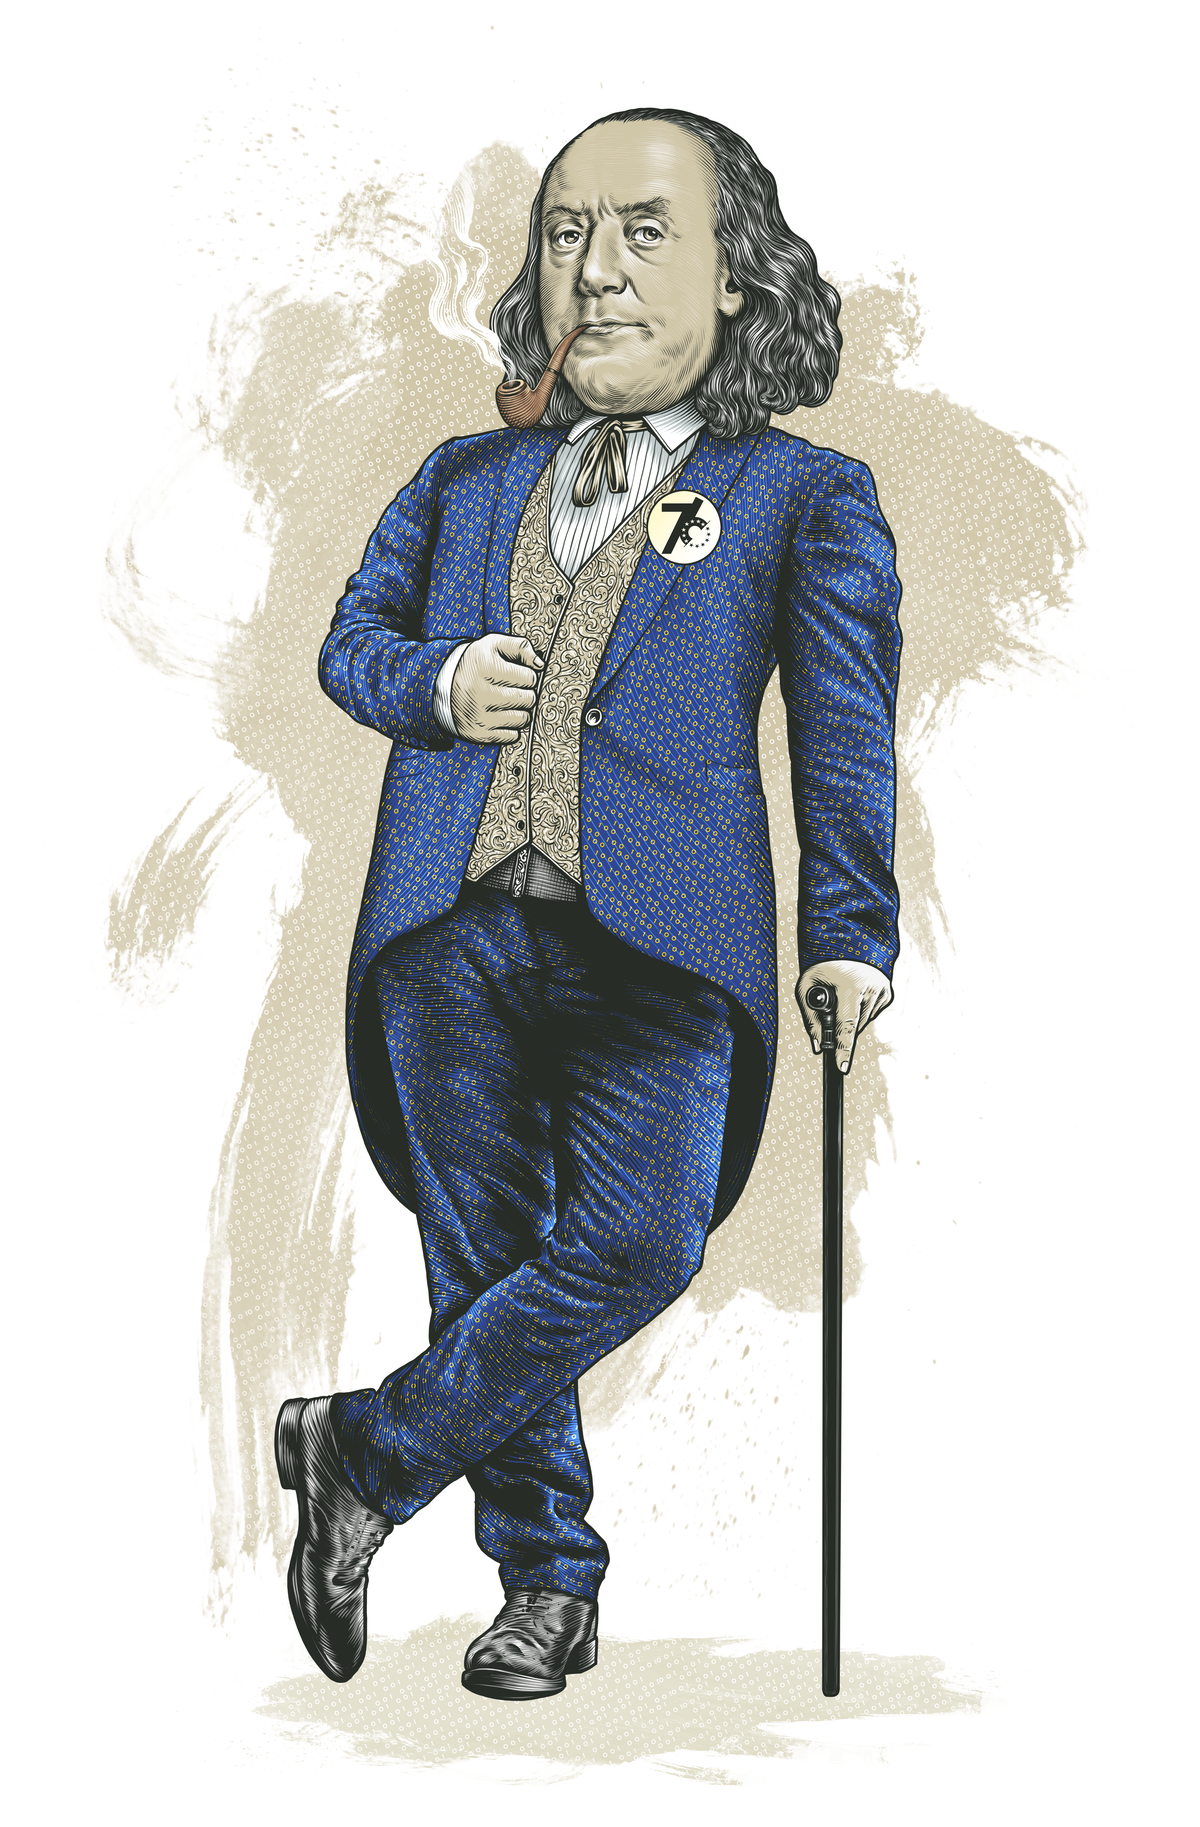 Fun Ben Franklin illustration